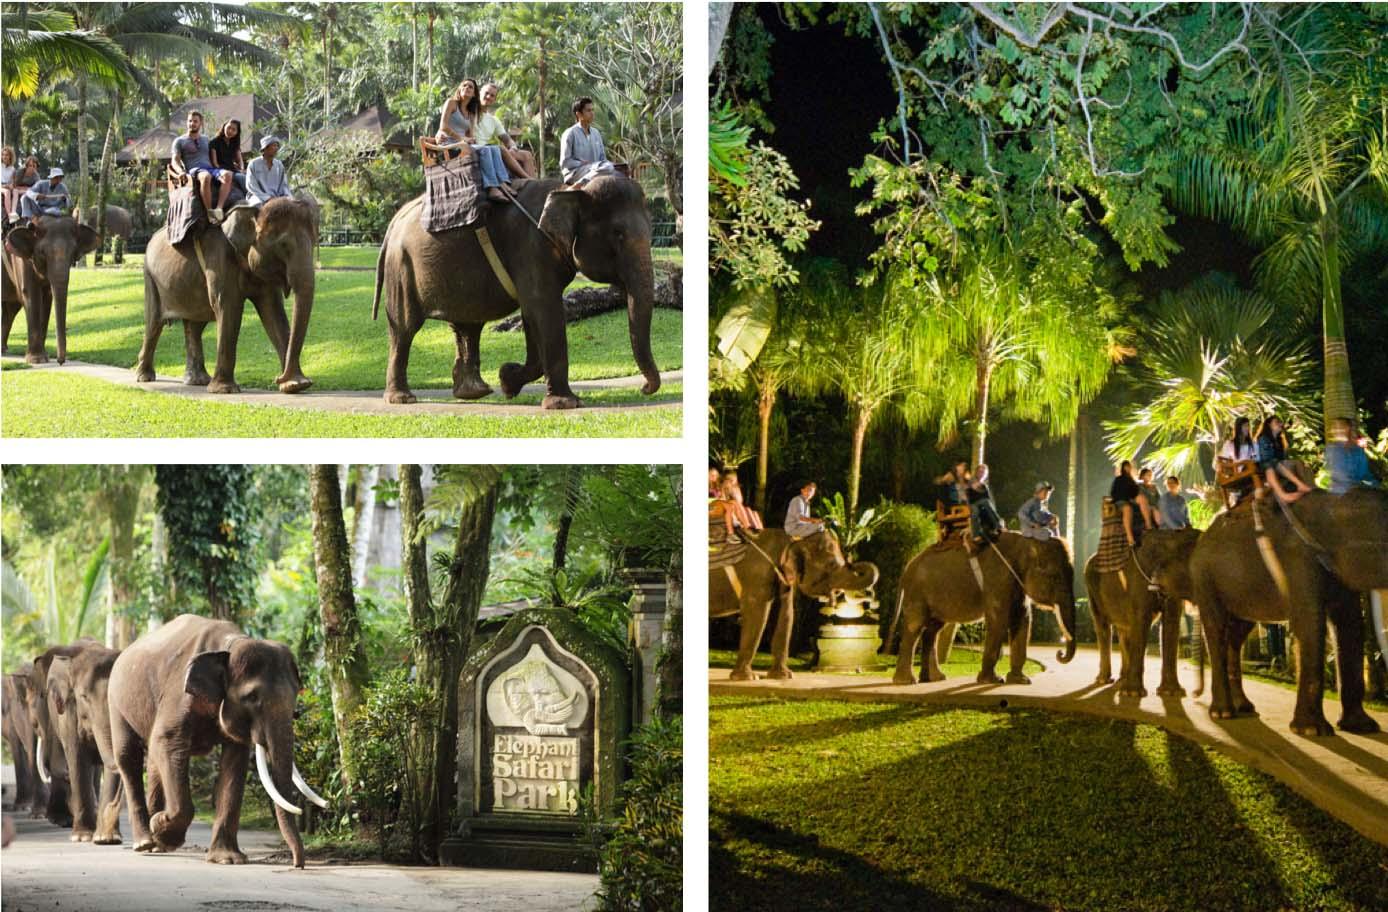 Elephant-Safari-Park